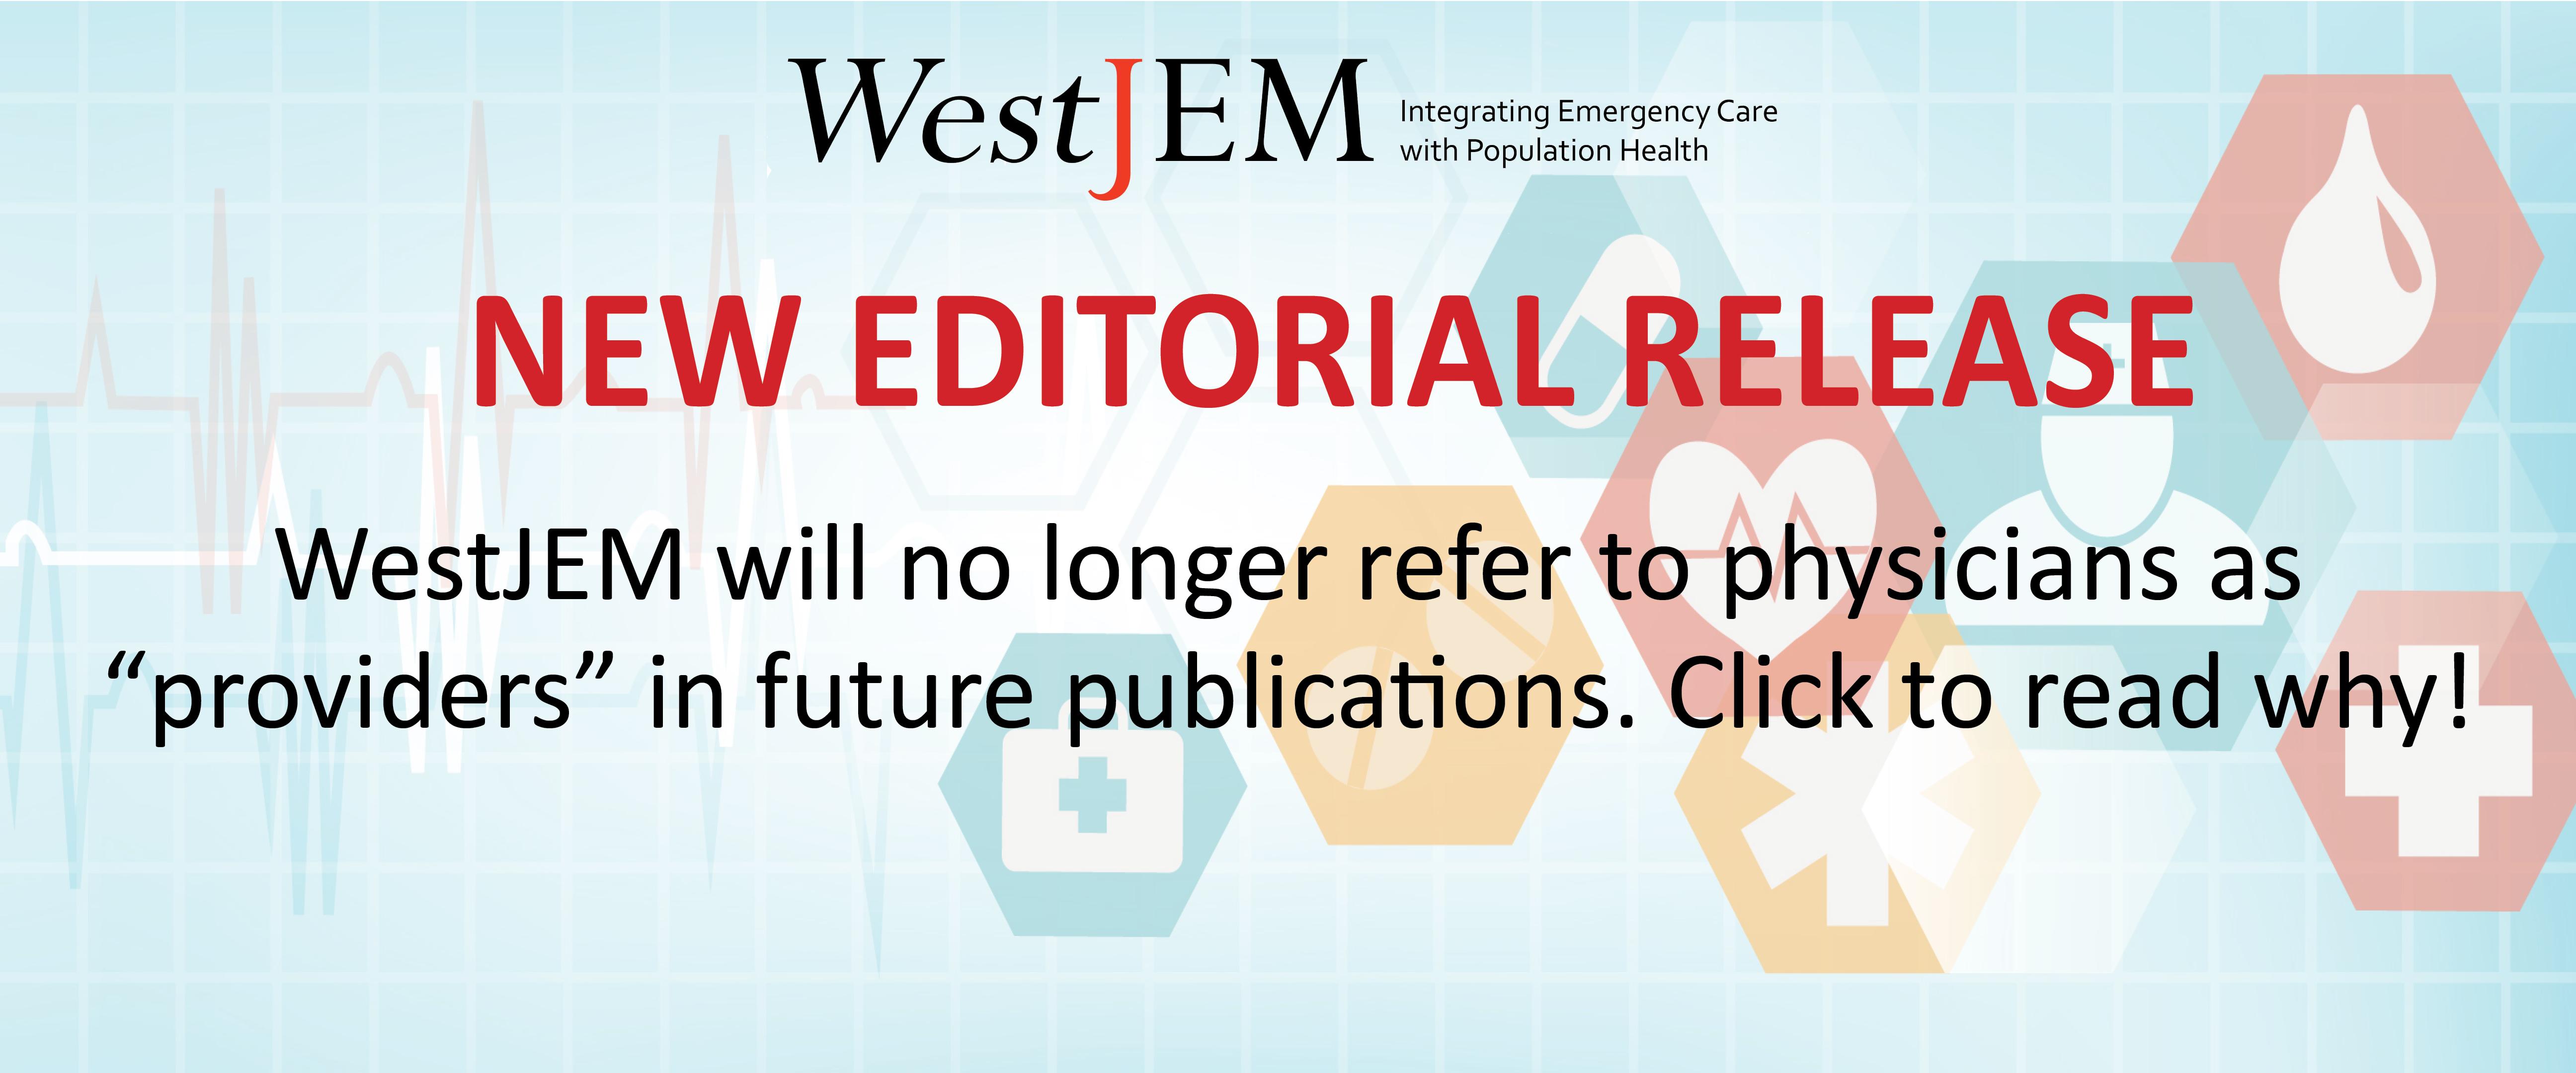 WestJEM-Provider-Editorial-Banner-draft-1